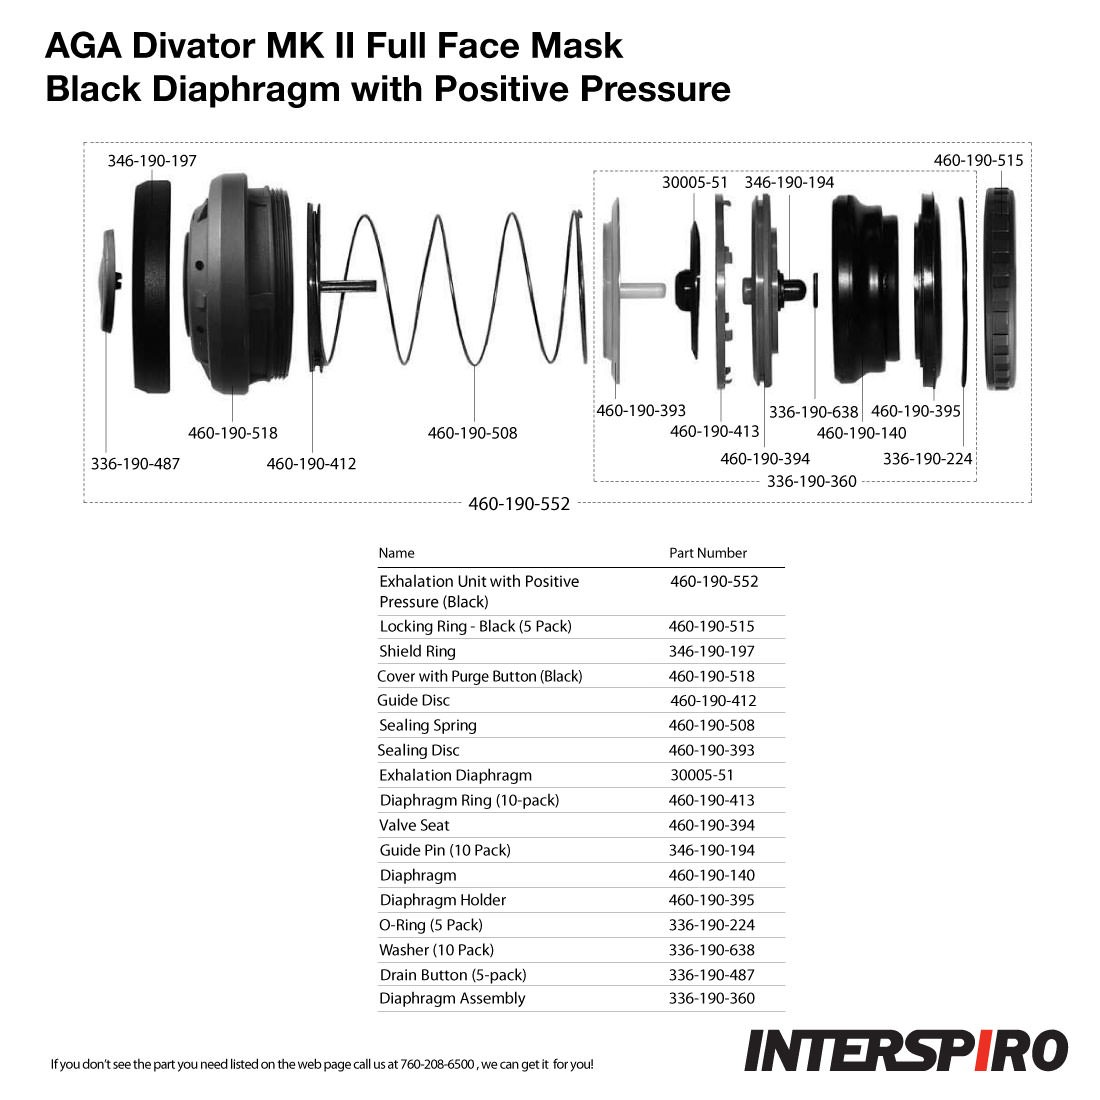 Interspiro AGA Divator MK II Full Face Mask with Positive Pressure Regulator - Natural Rubber - Grey - Diaphragm